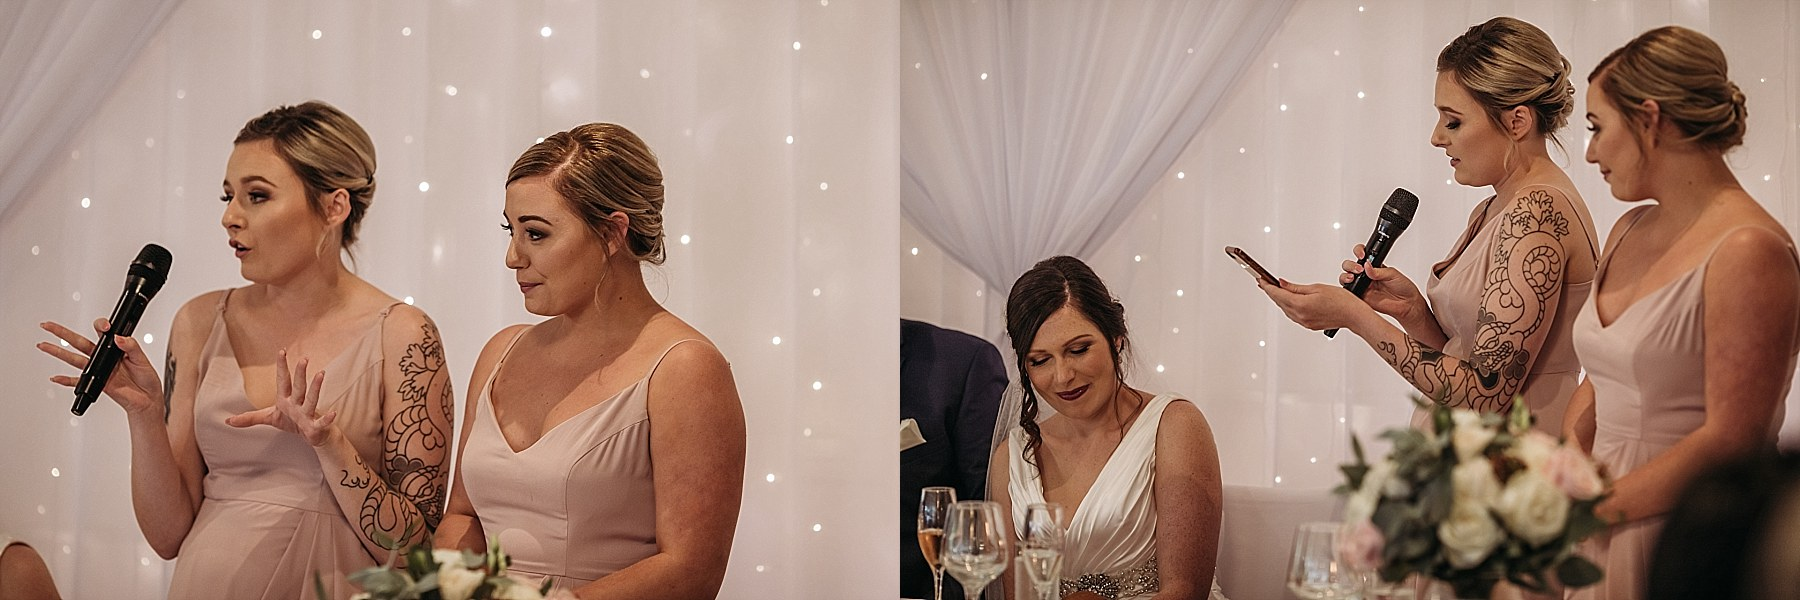 Allely Estate Wedding Auckland Wedding Photographer - Jana & Laurie_0198.jpg